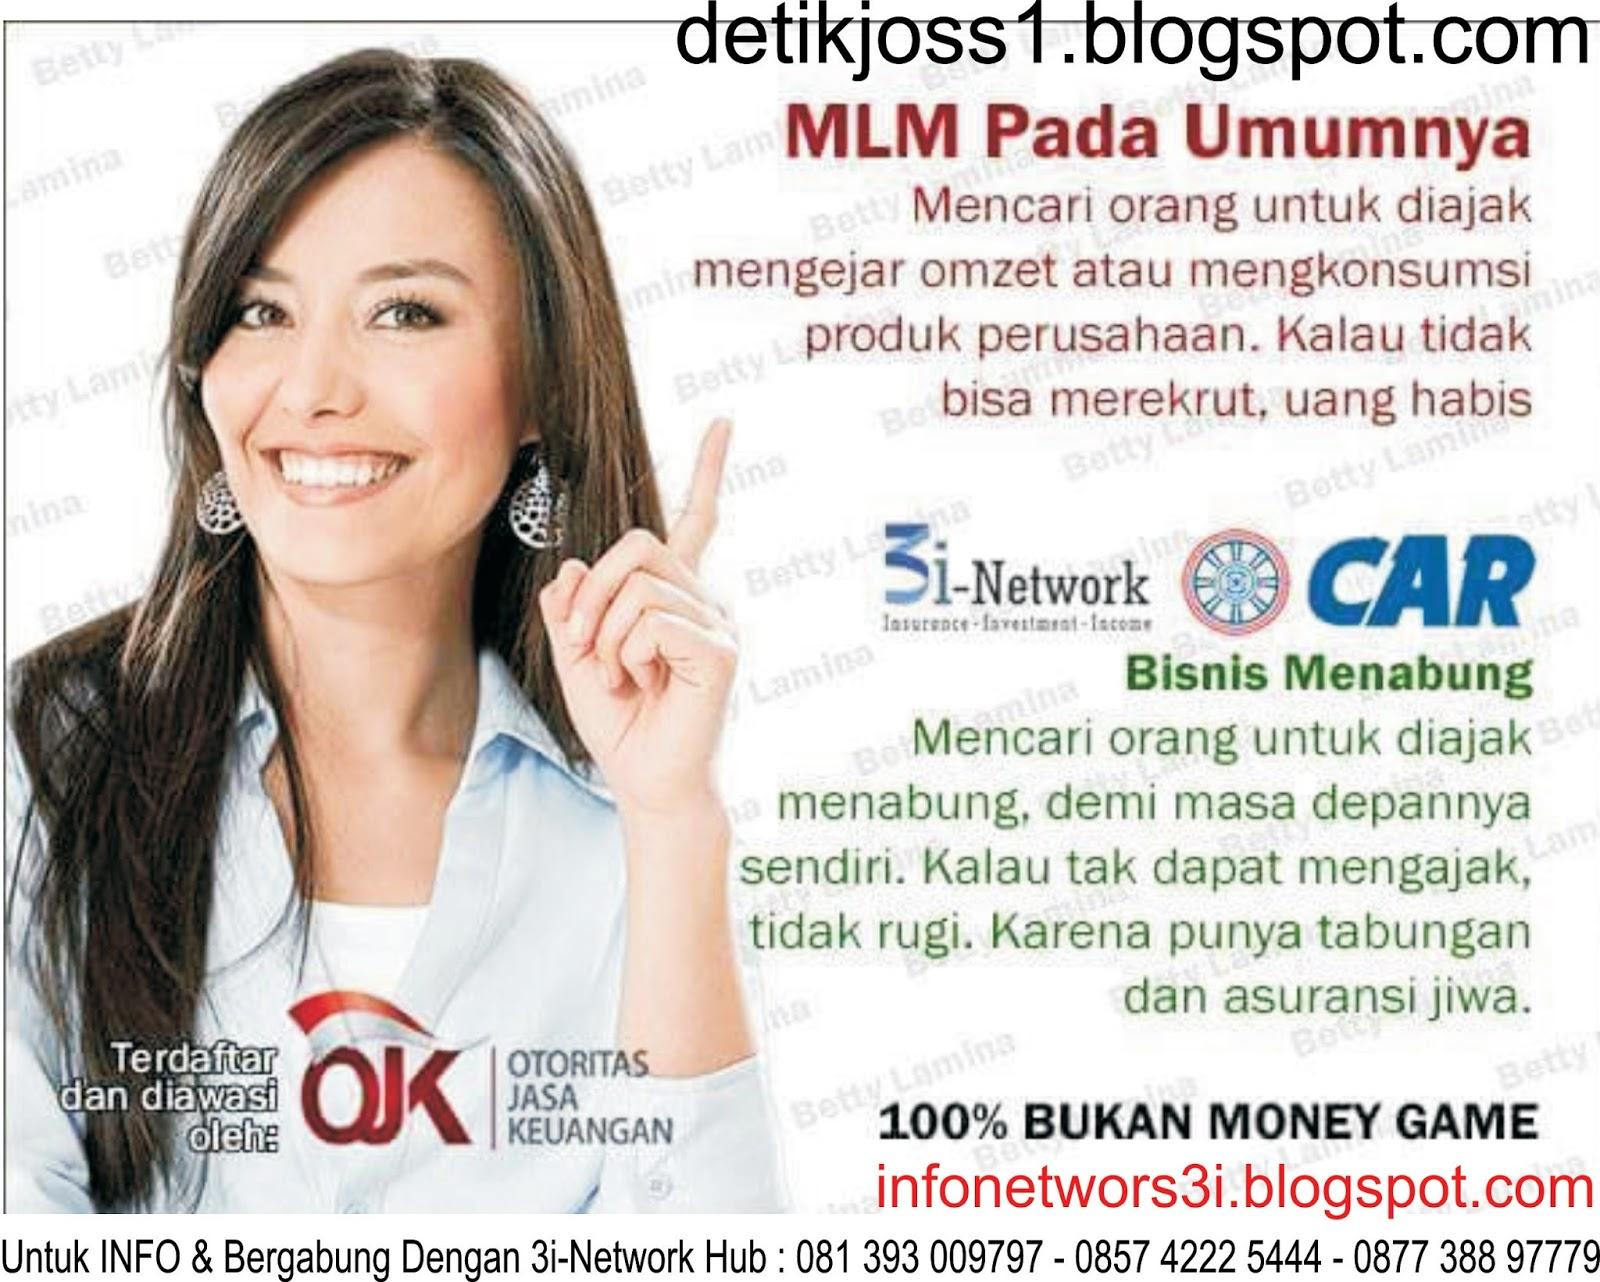 Agen Baja Ringan Di Denpasar Peluang Sukses Utk : Guru, Dosen, Karyawan, Ojek, Sopir ...